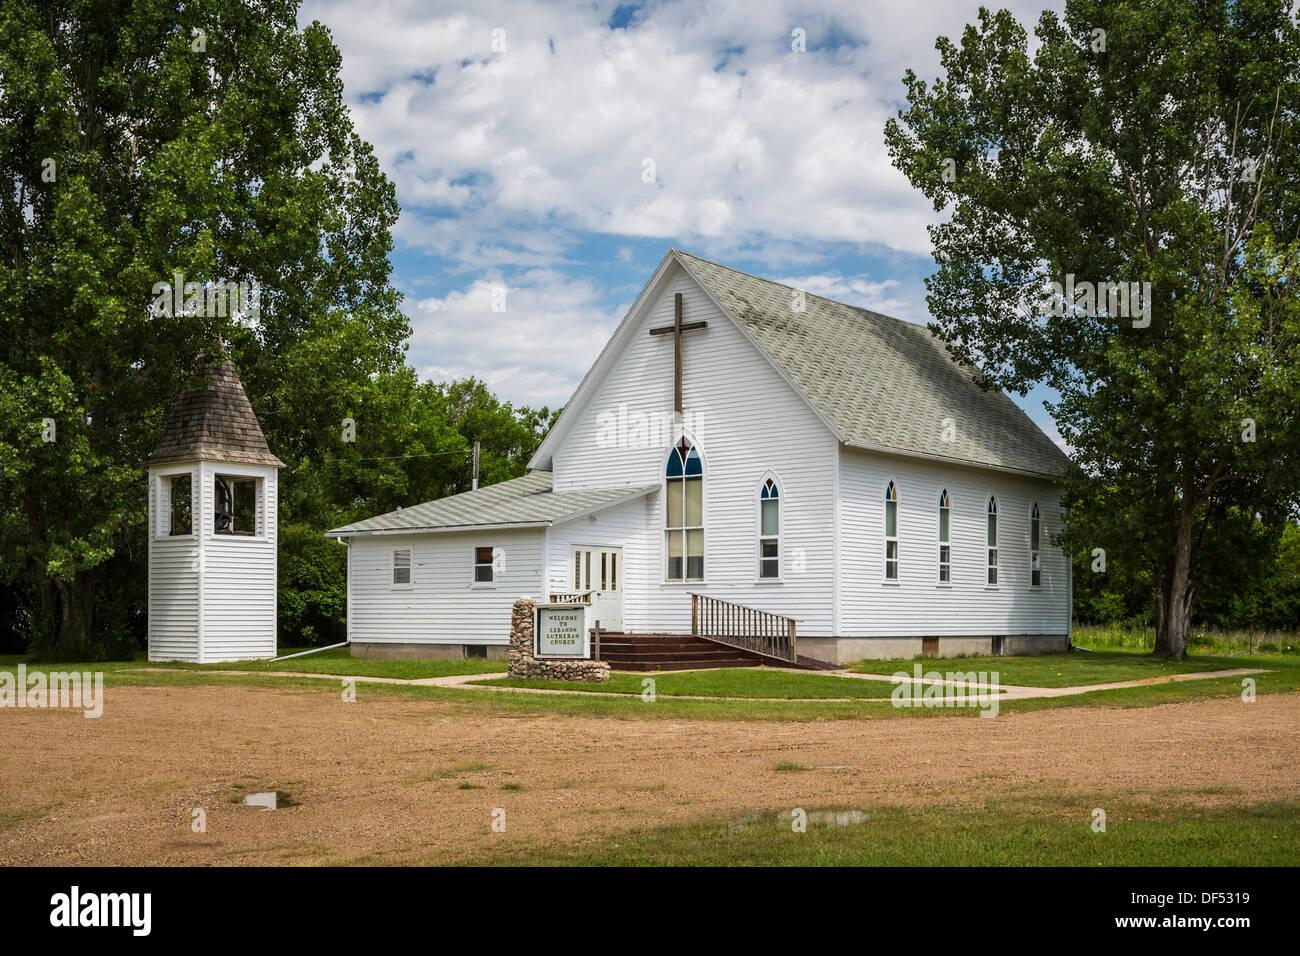 The Lutheran Church building in Lebanon, North Dakota, USA. - Stock Image